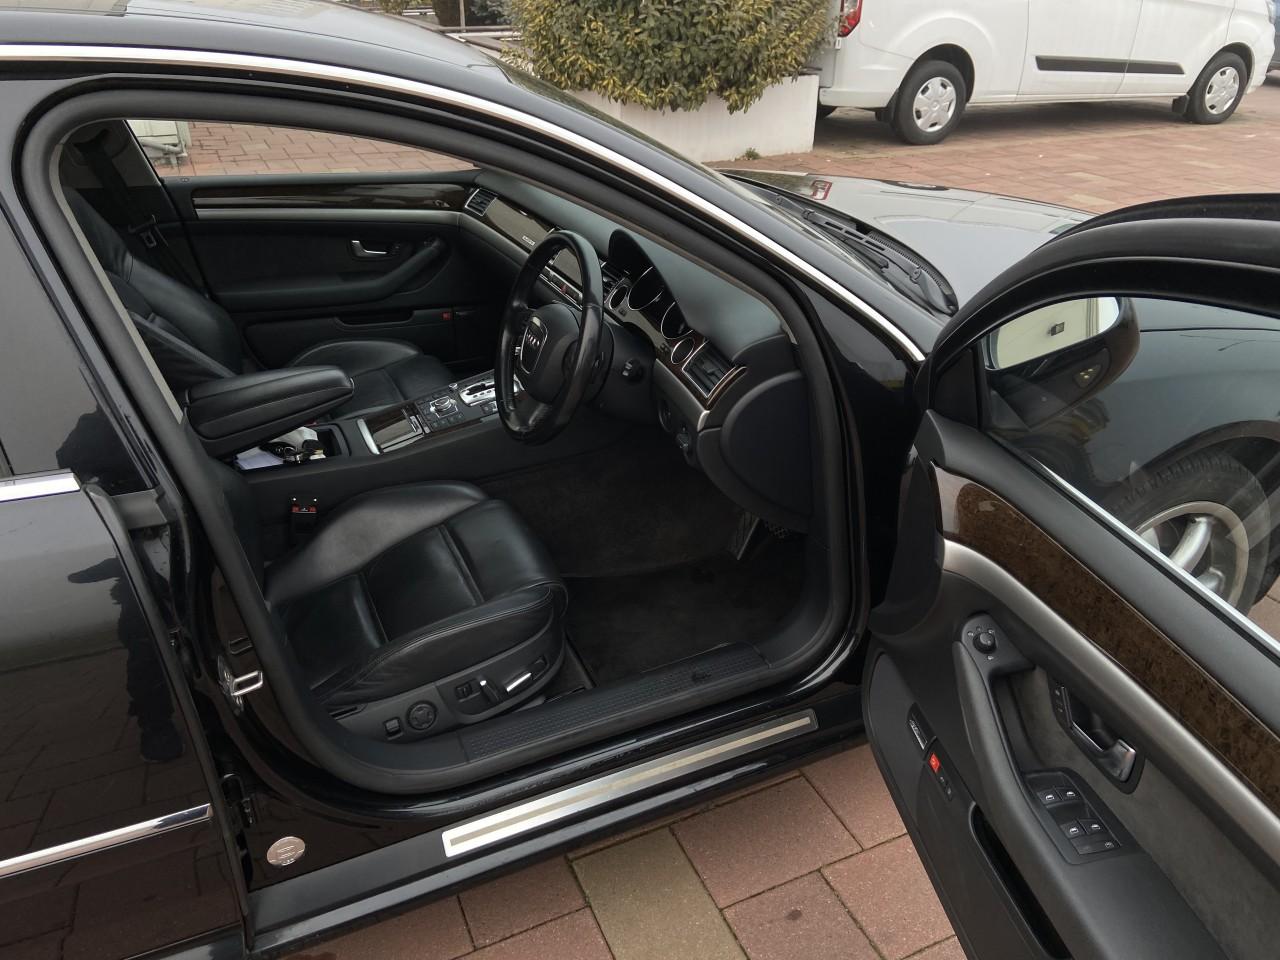 Audi A8 3.0 TDI Quattro 2007